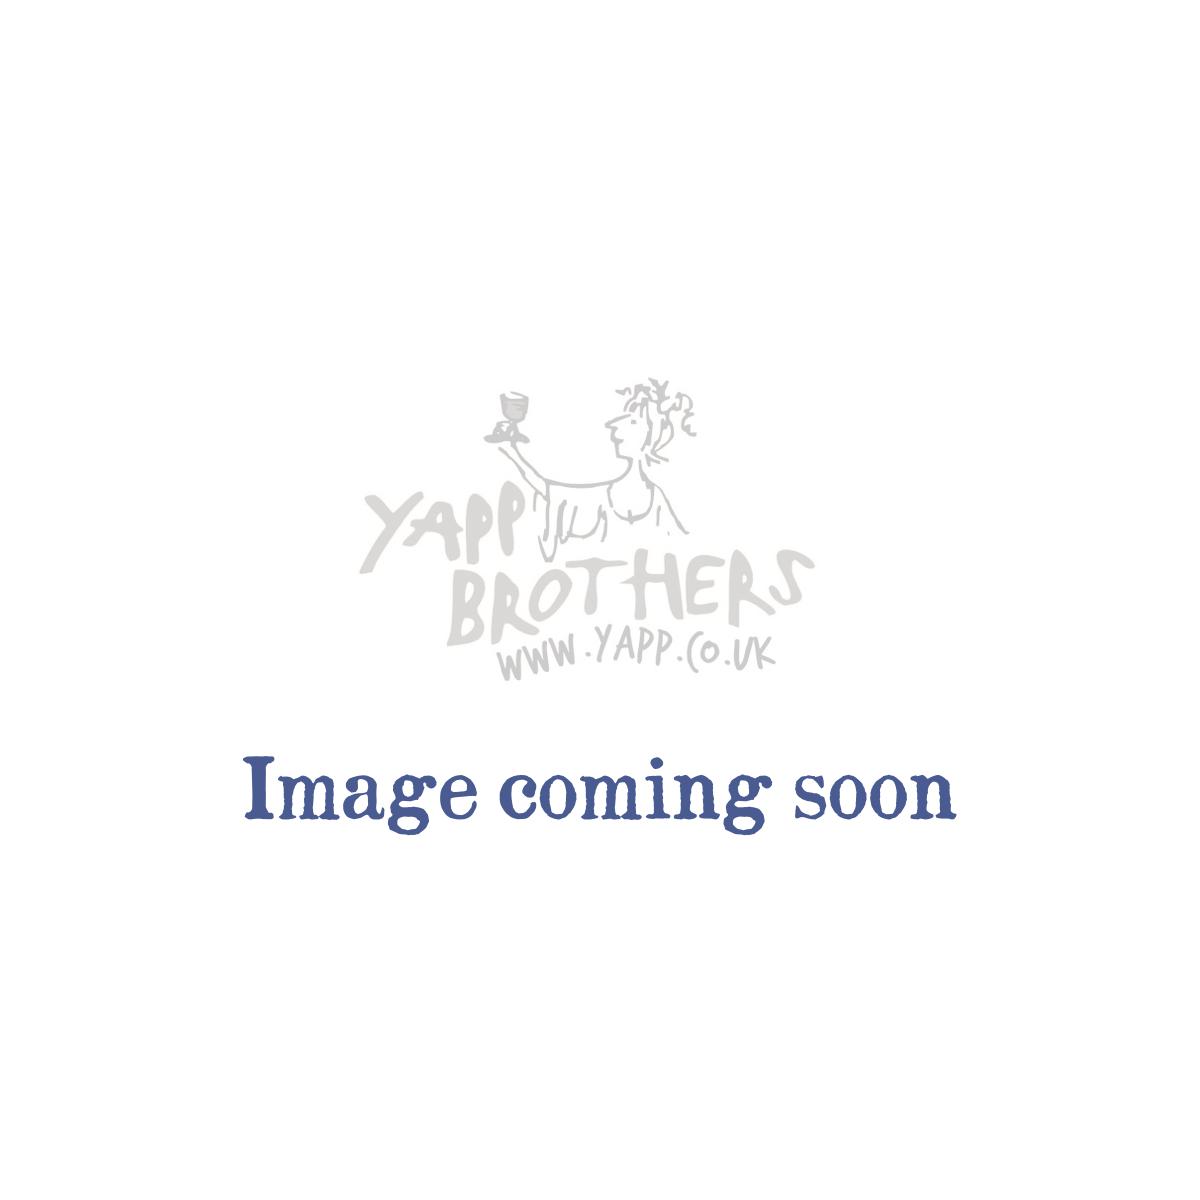 Pastis: Distillerie Manguin - Bottle Rear Label